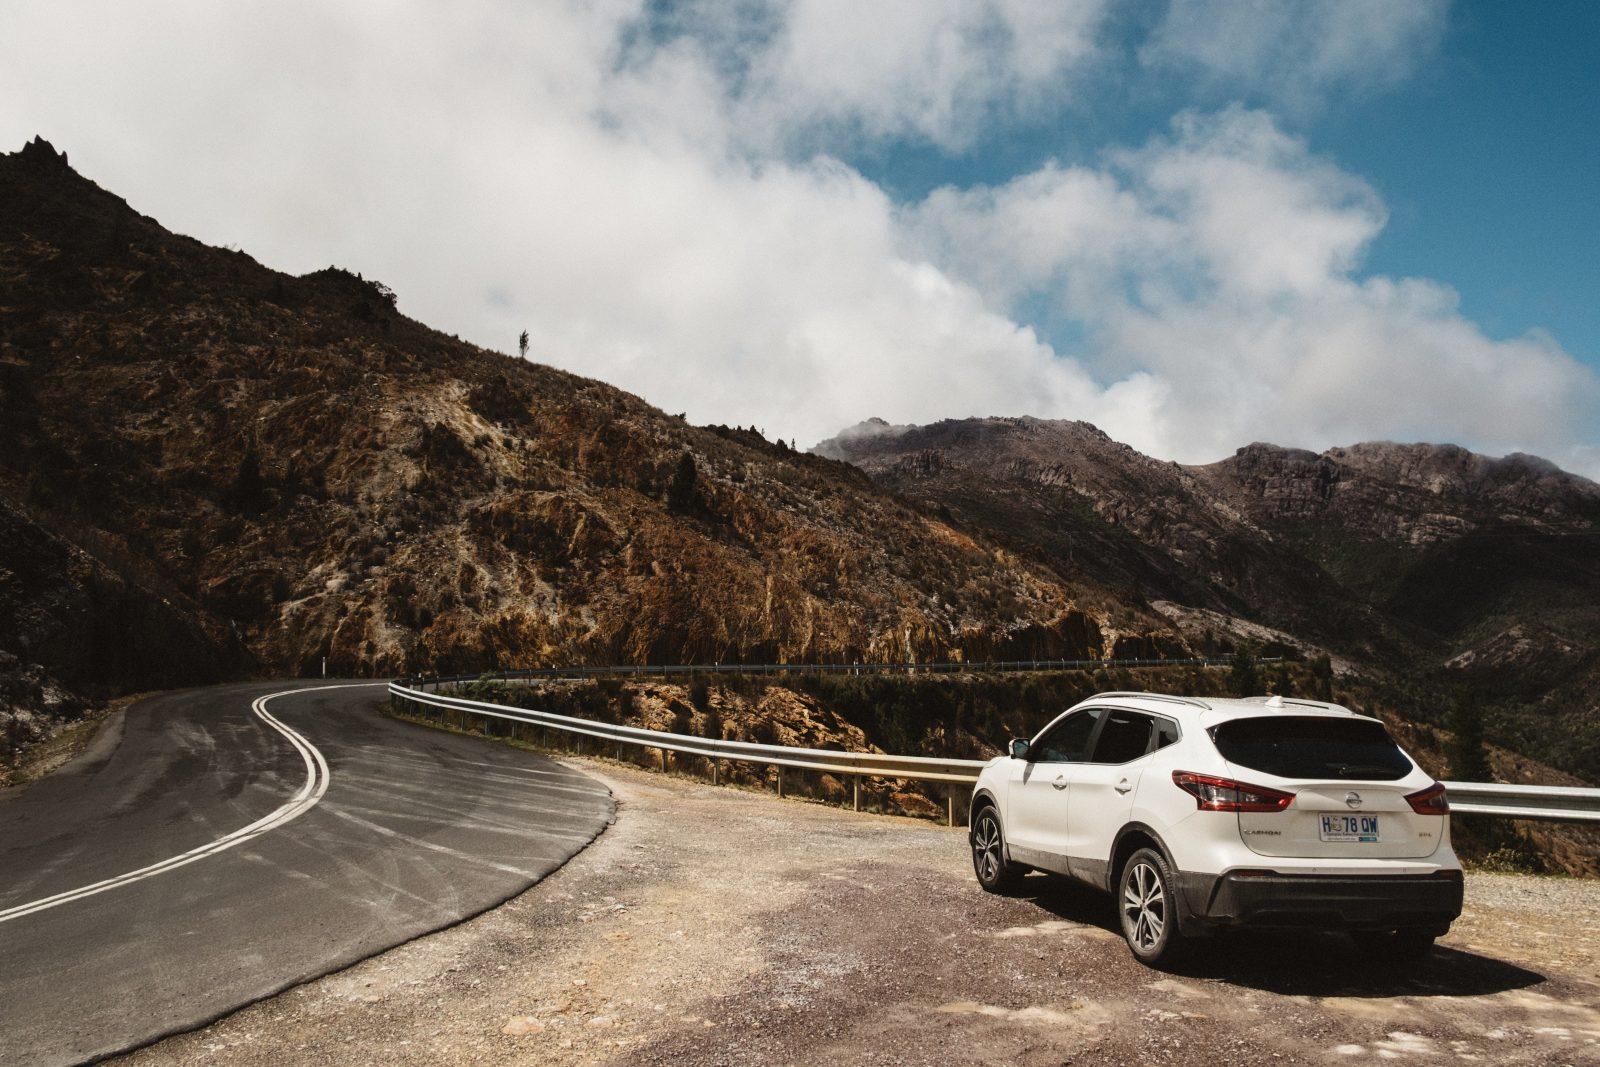 Car rental in Strahan Tasmania